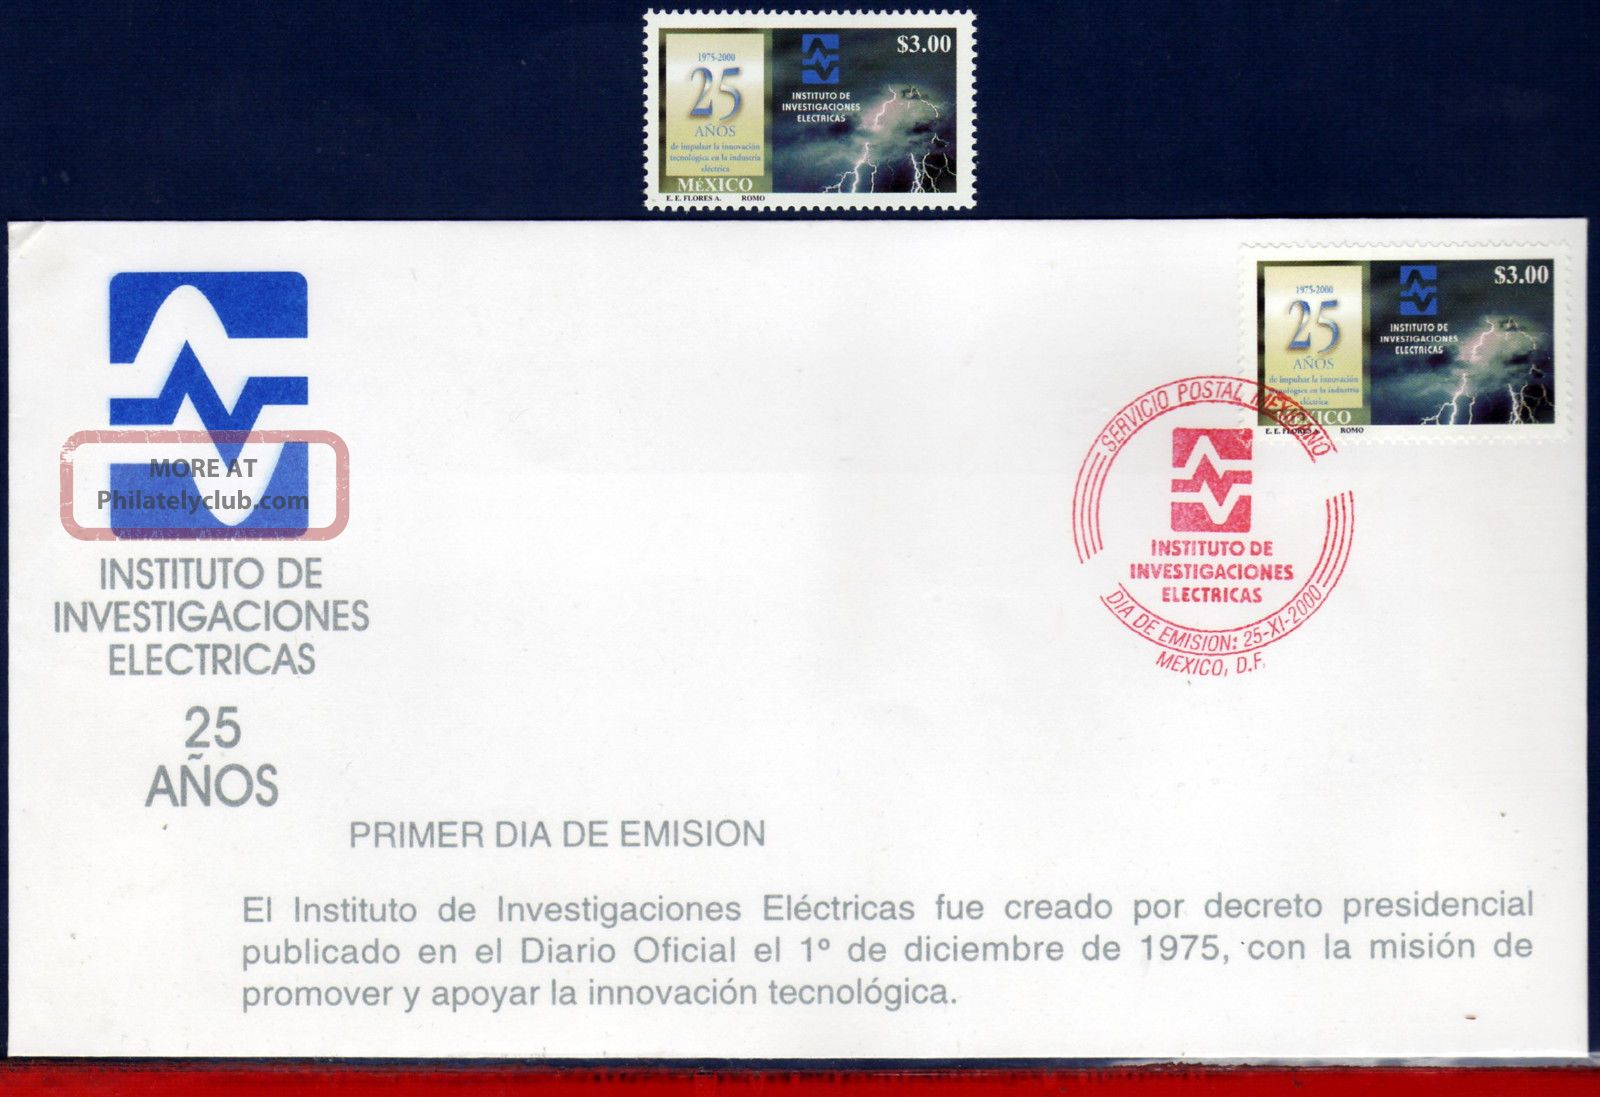 2214fd Mexico 2000 - Electrical Investigation Institute,  Electricity,  Mi 2885 Latin America photo